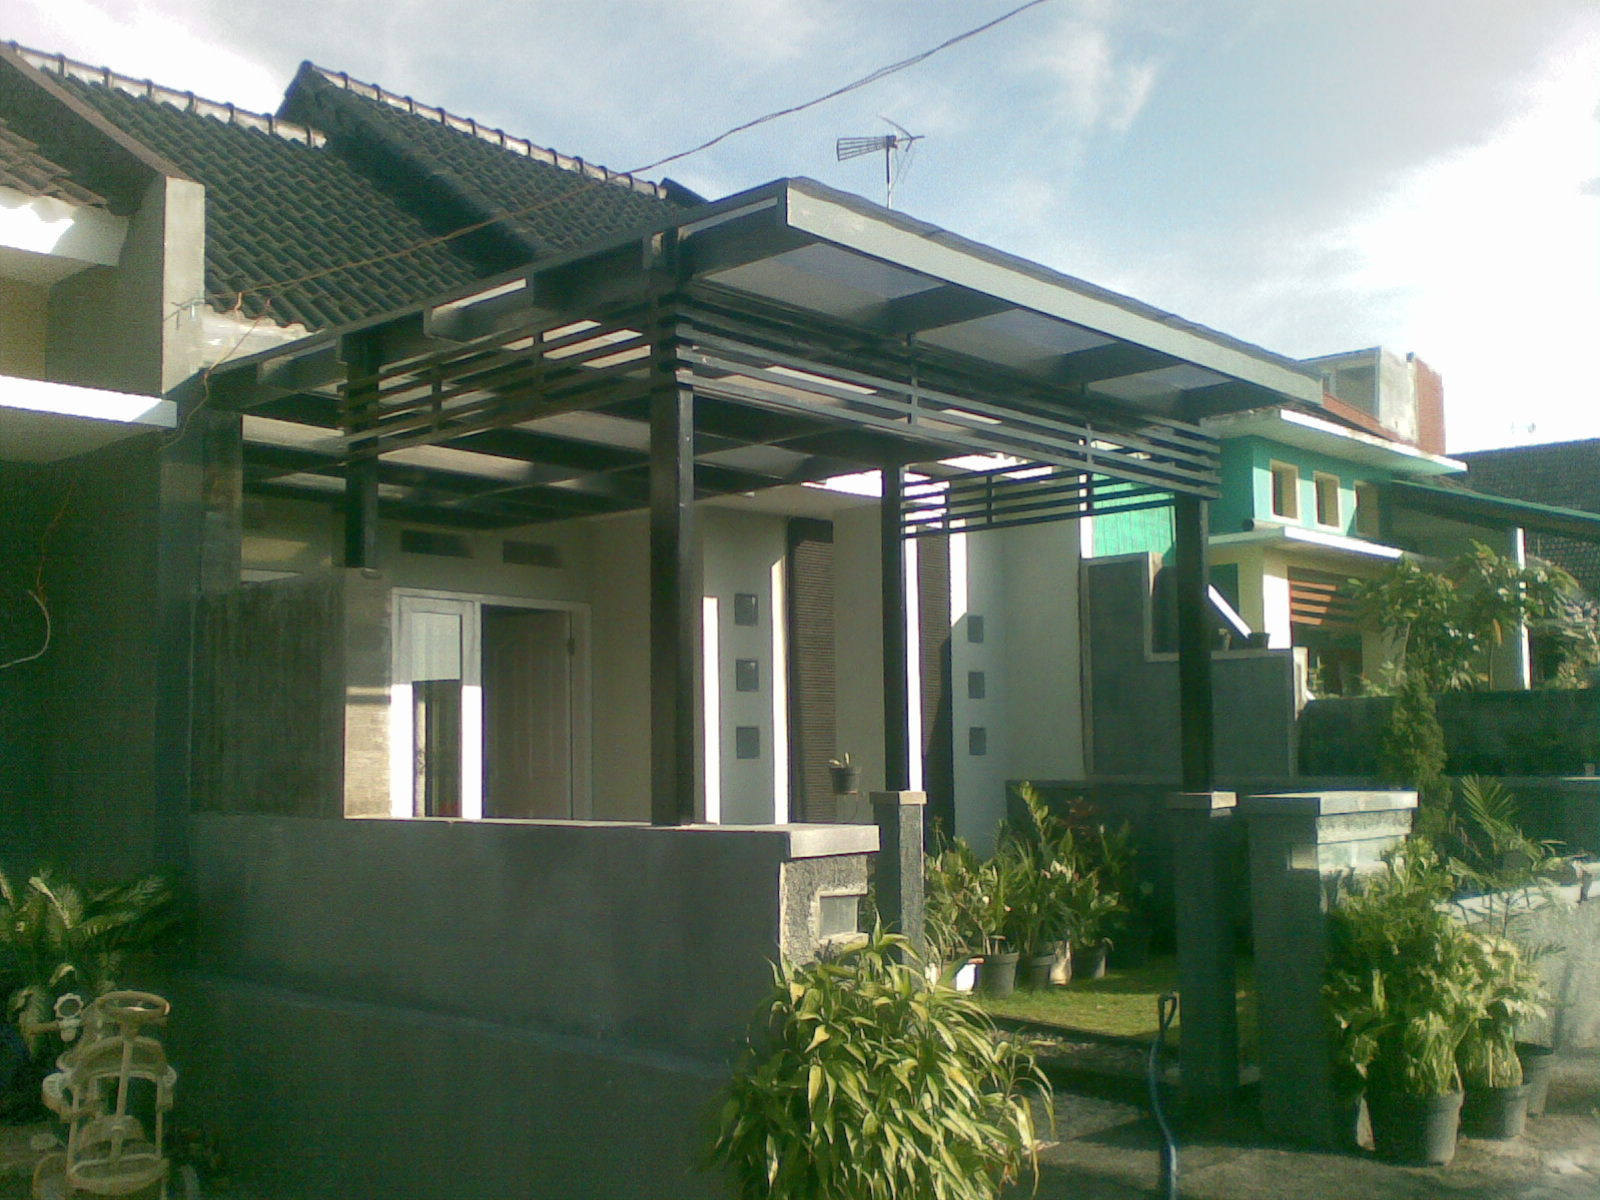 ... selesai juga penutup carport rumahku. penutup atap carport ... 2015